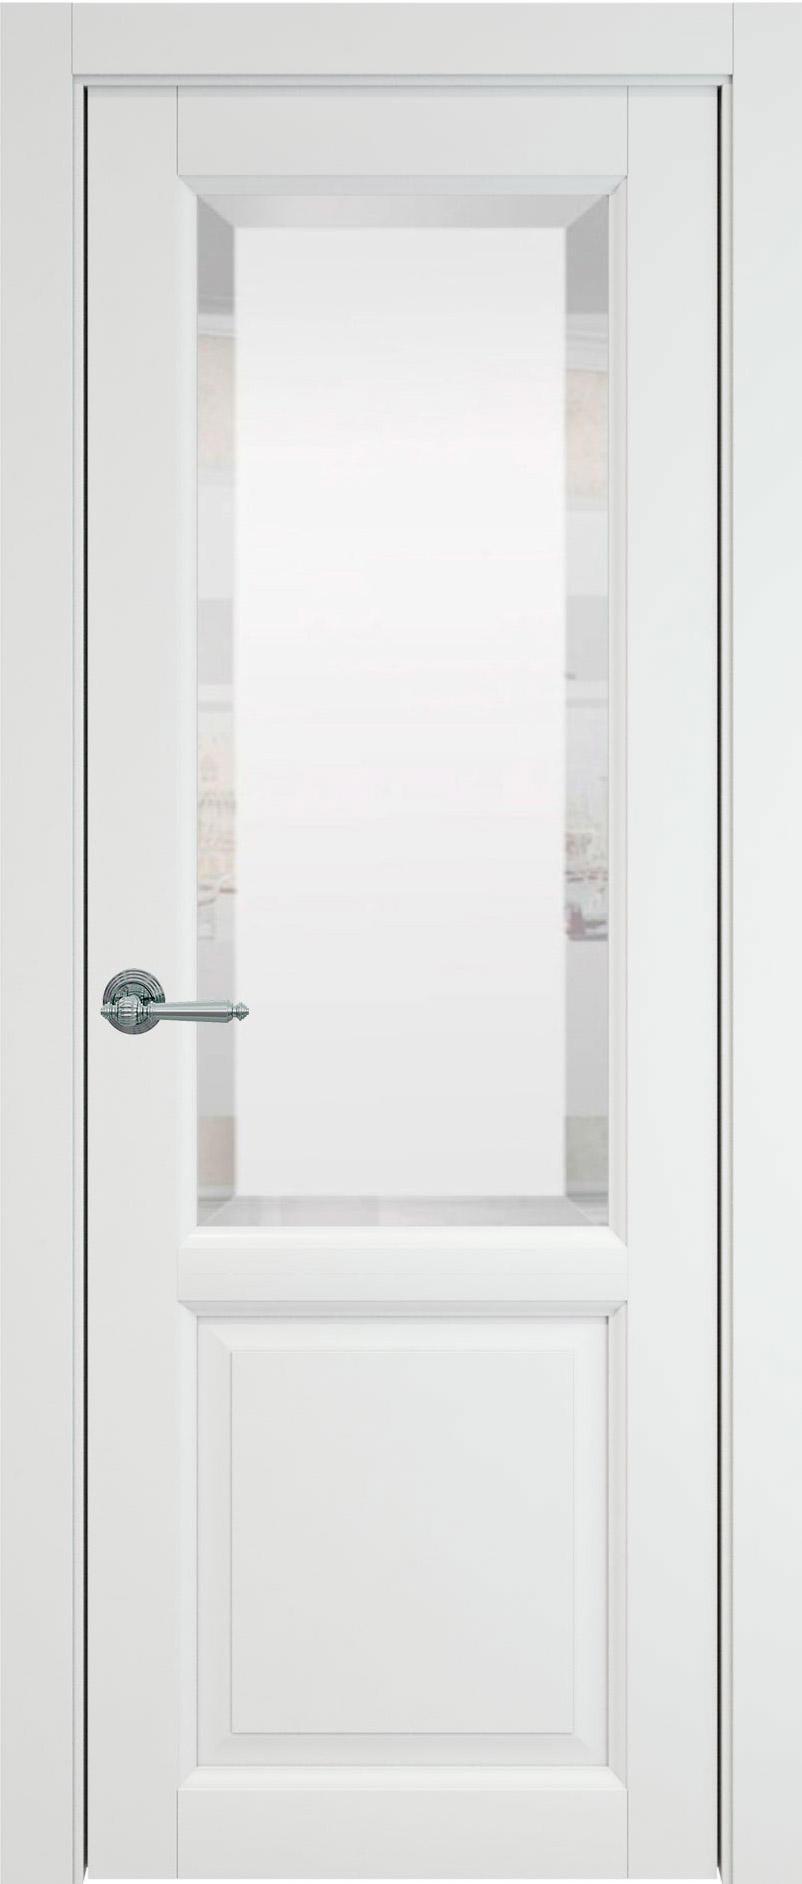 Dinastia цвет - Белая эмаль (RAL 9003) Со стеклом (ДО)